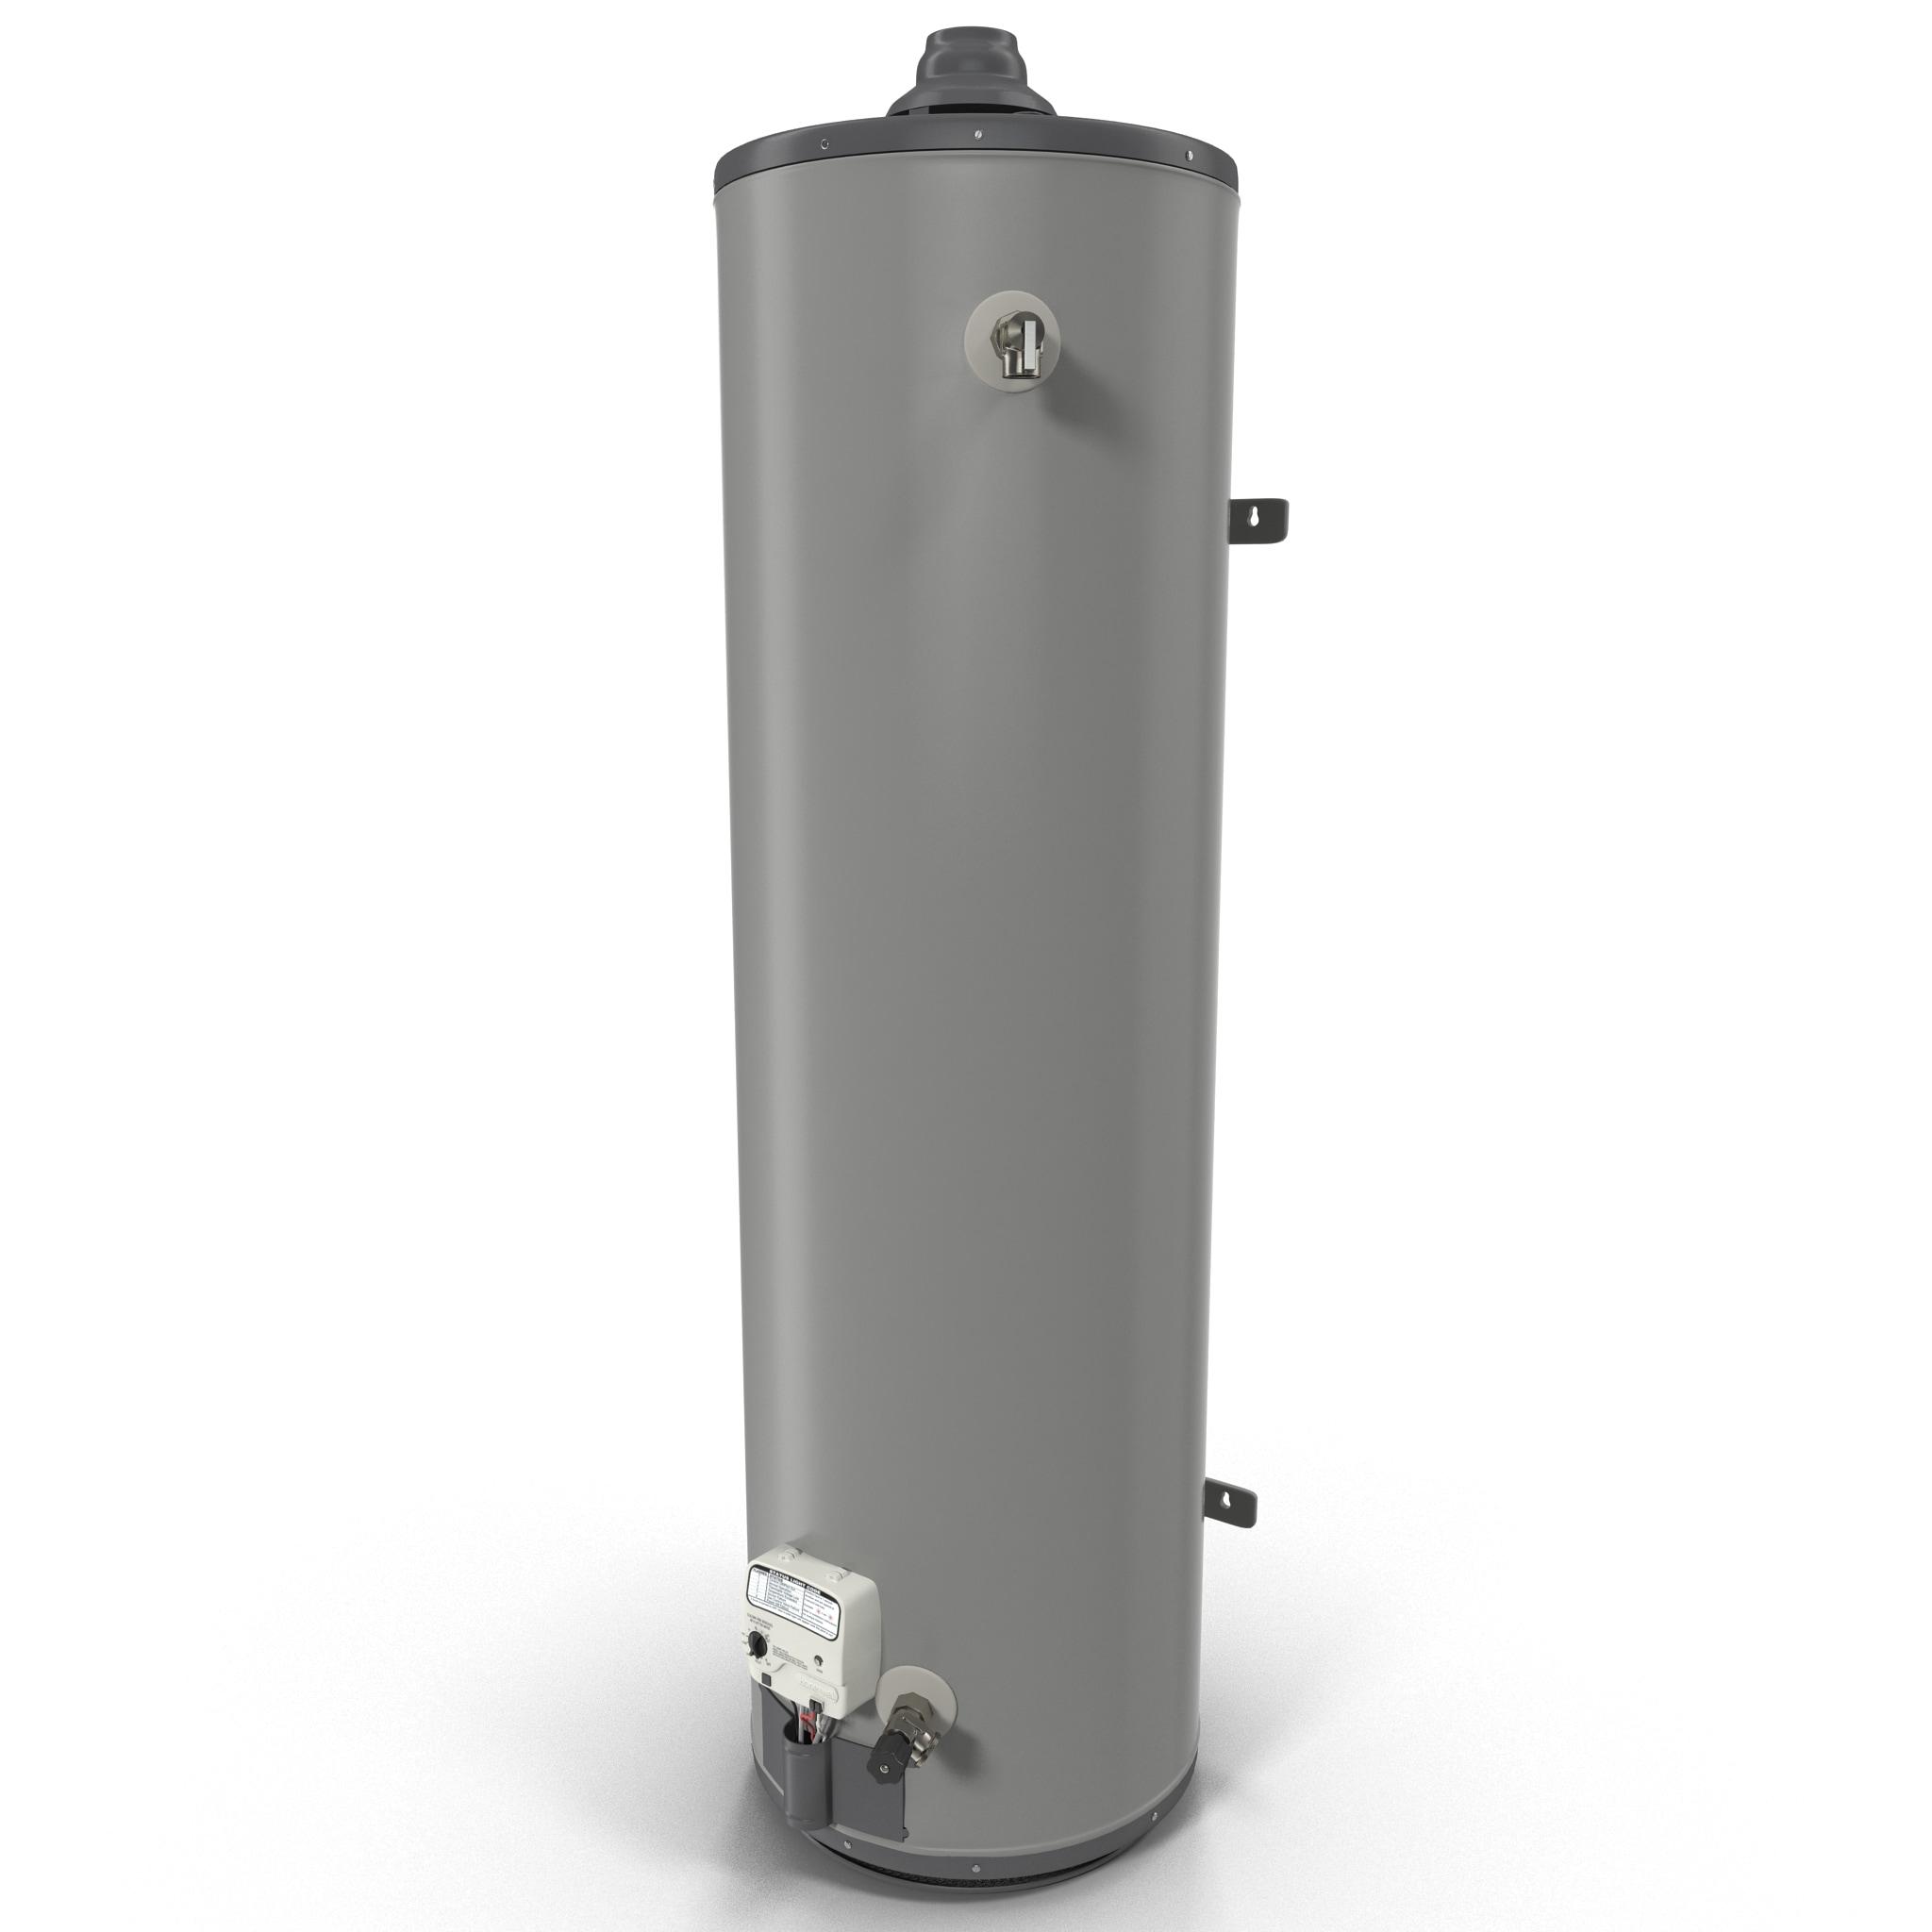 000_Hot_Water_Heater.jpg